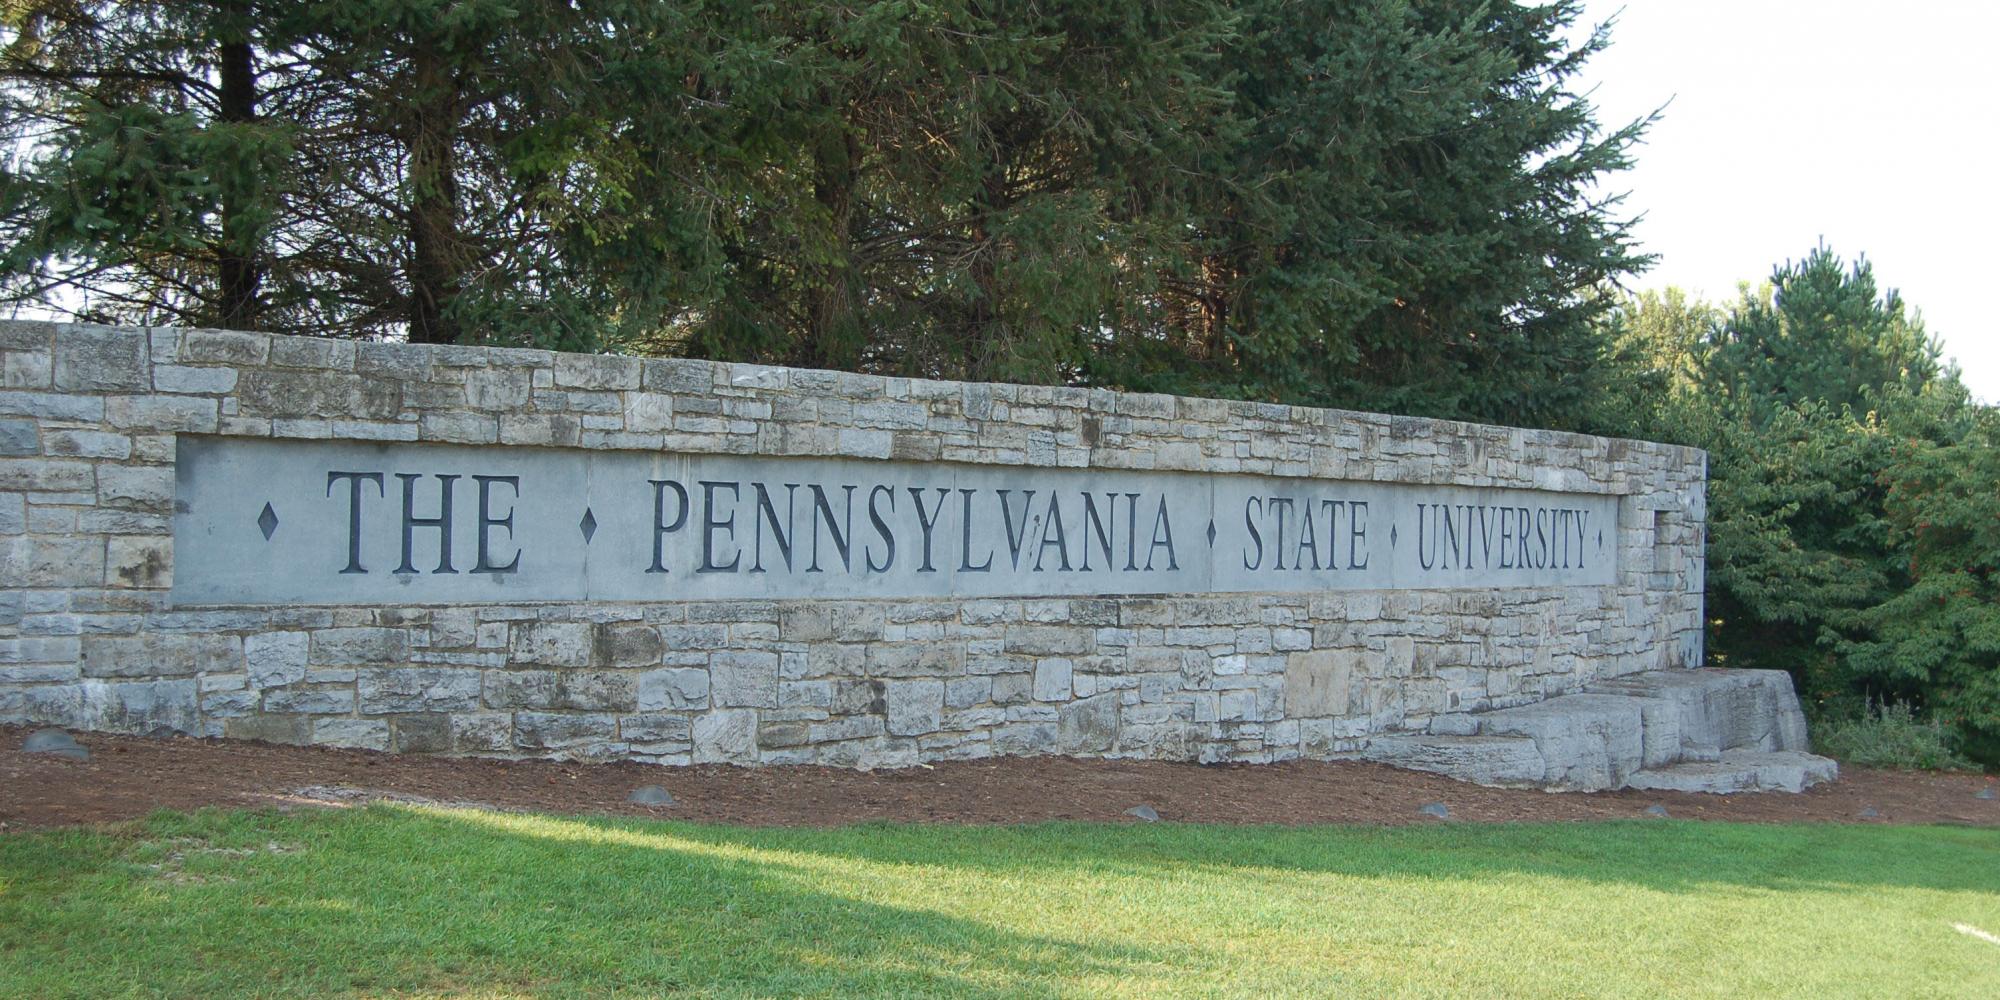 Penn State Universtiy Tours